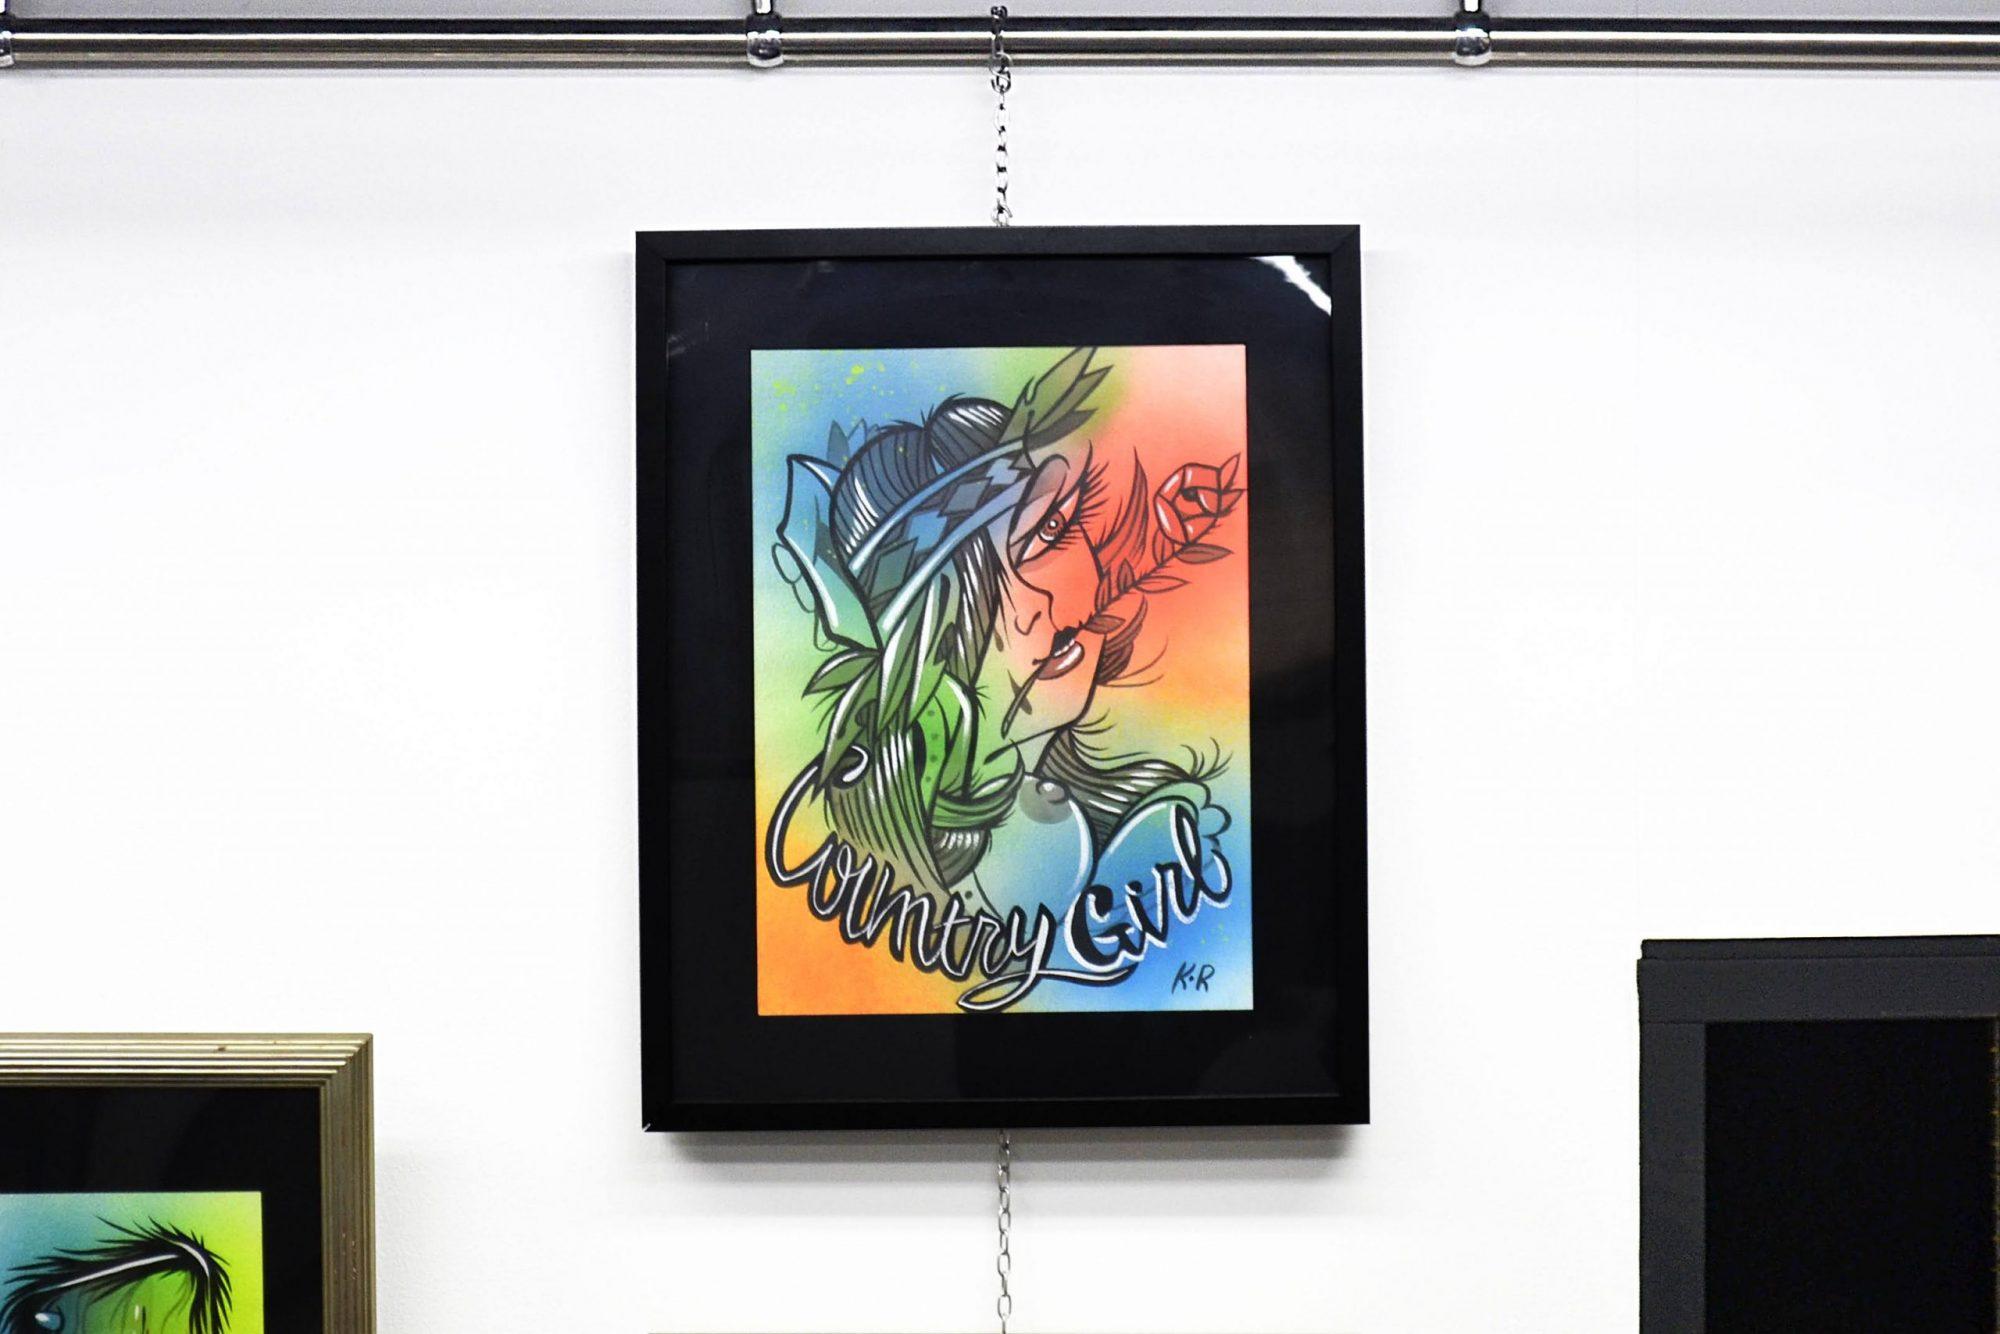 KINGRAT TATTOO 作品 | LAVA gallery | Tattoo artist: Yuji Anai | キングラット | ラバギャラリー | タトゥーアート | 福岡県北九州市 | 0062_scaled作品